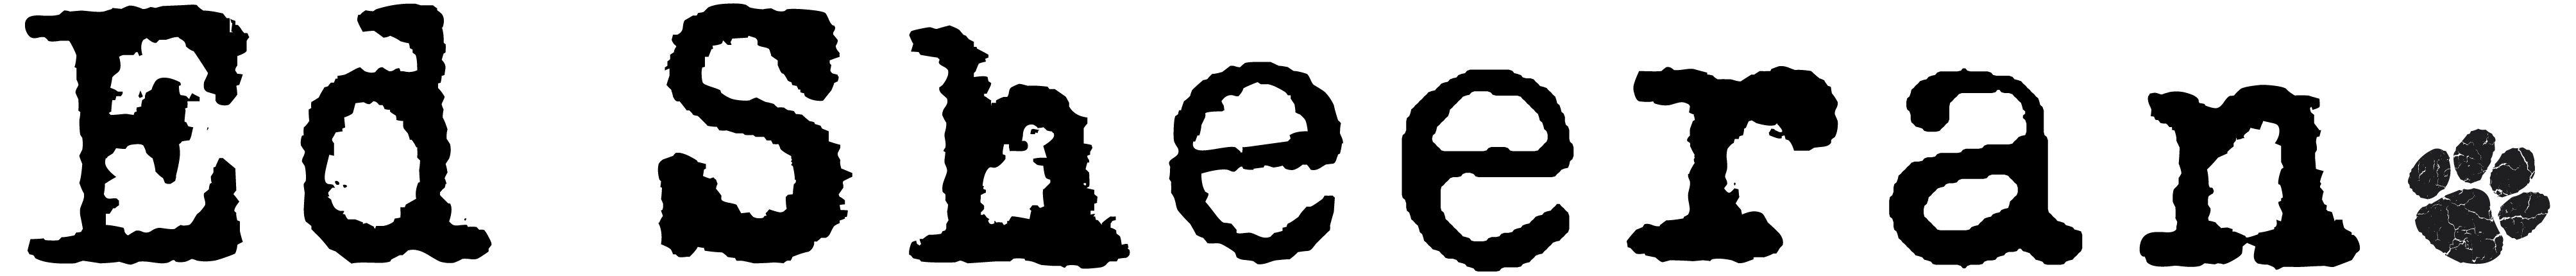 Ed Sheeran logo in 2019.